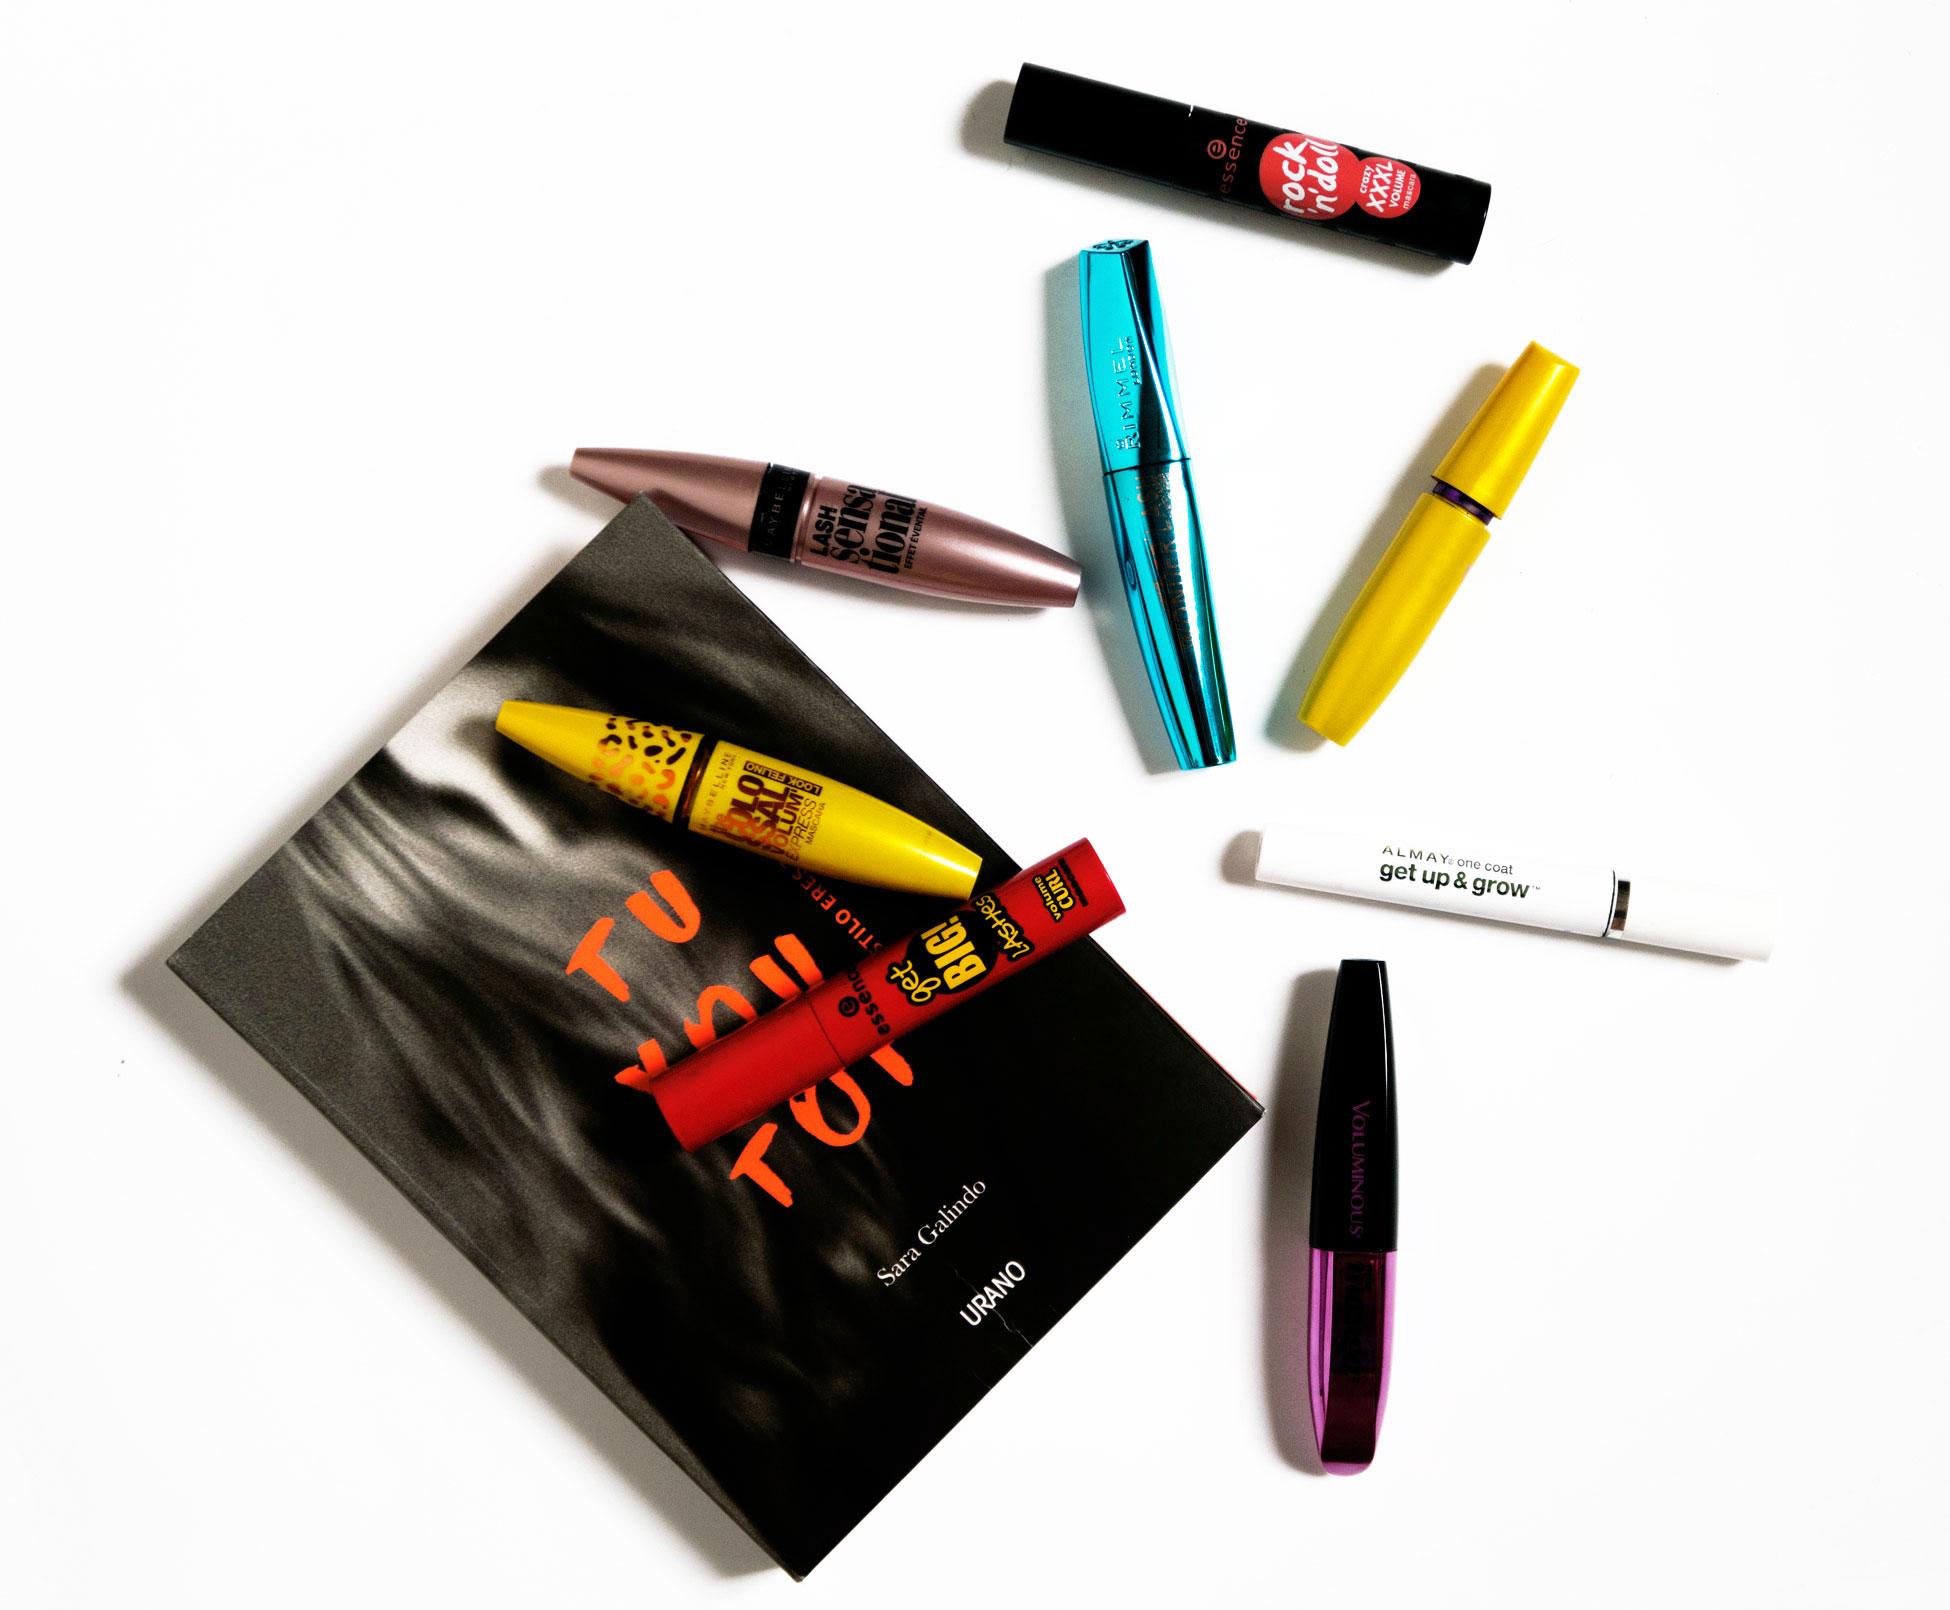 Mascara Tips & Tricks